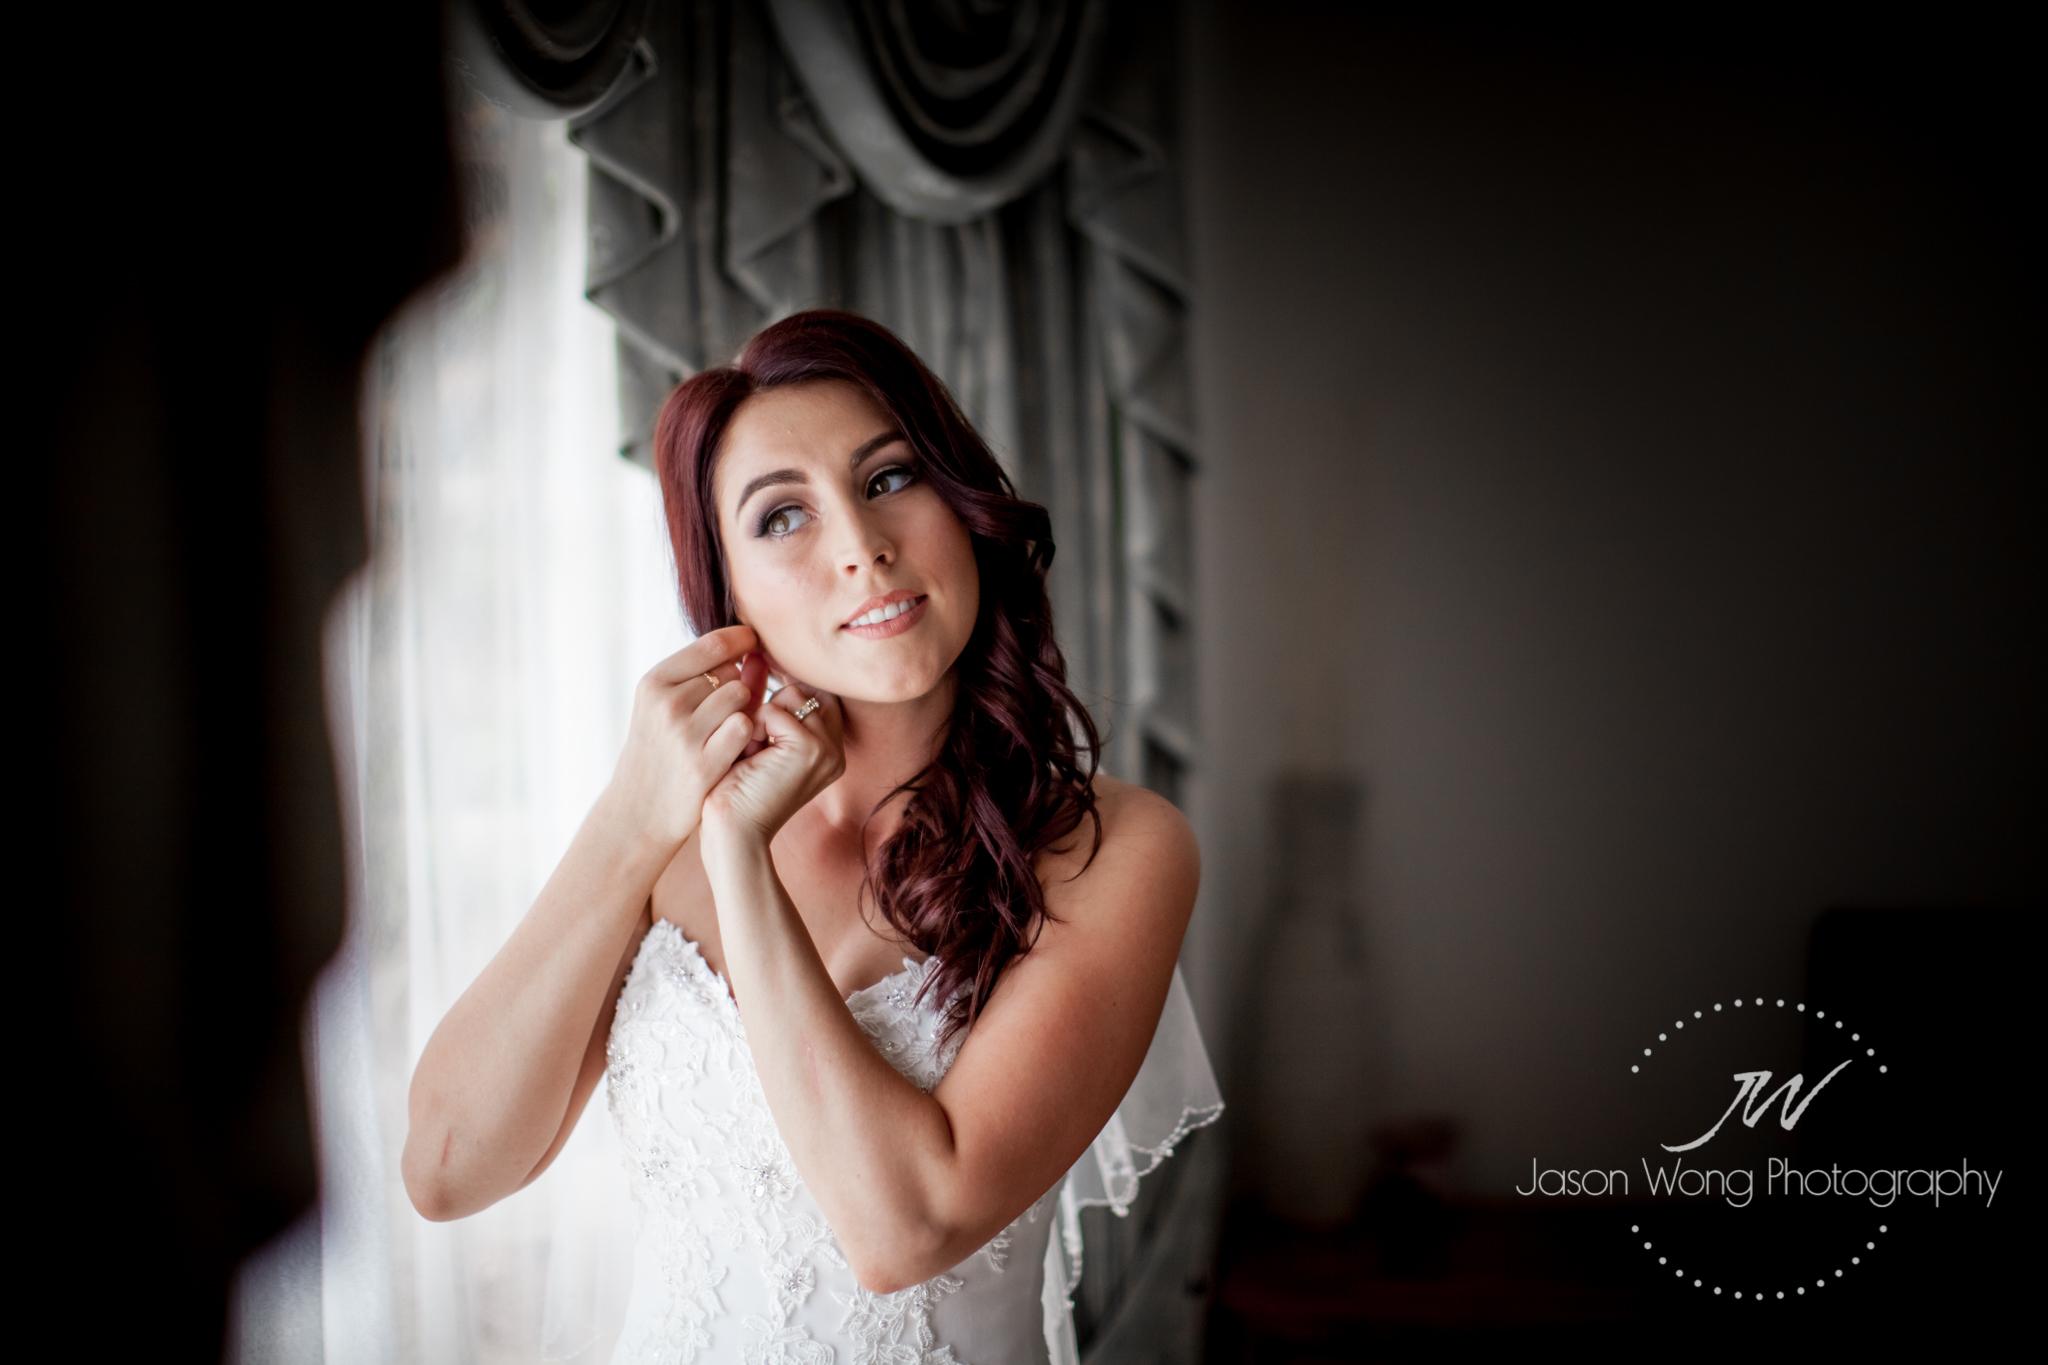 beautiful-bride-putting-on-ear-ring.jpg